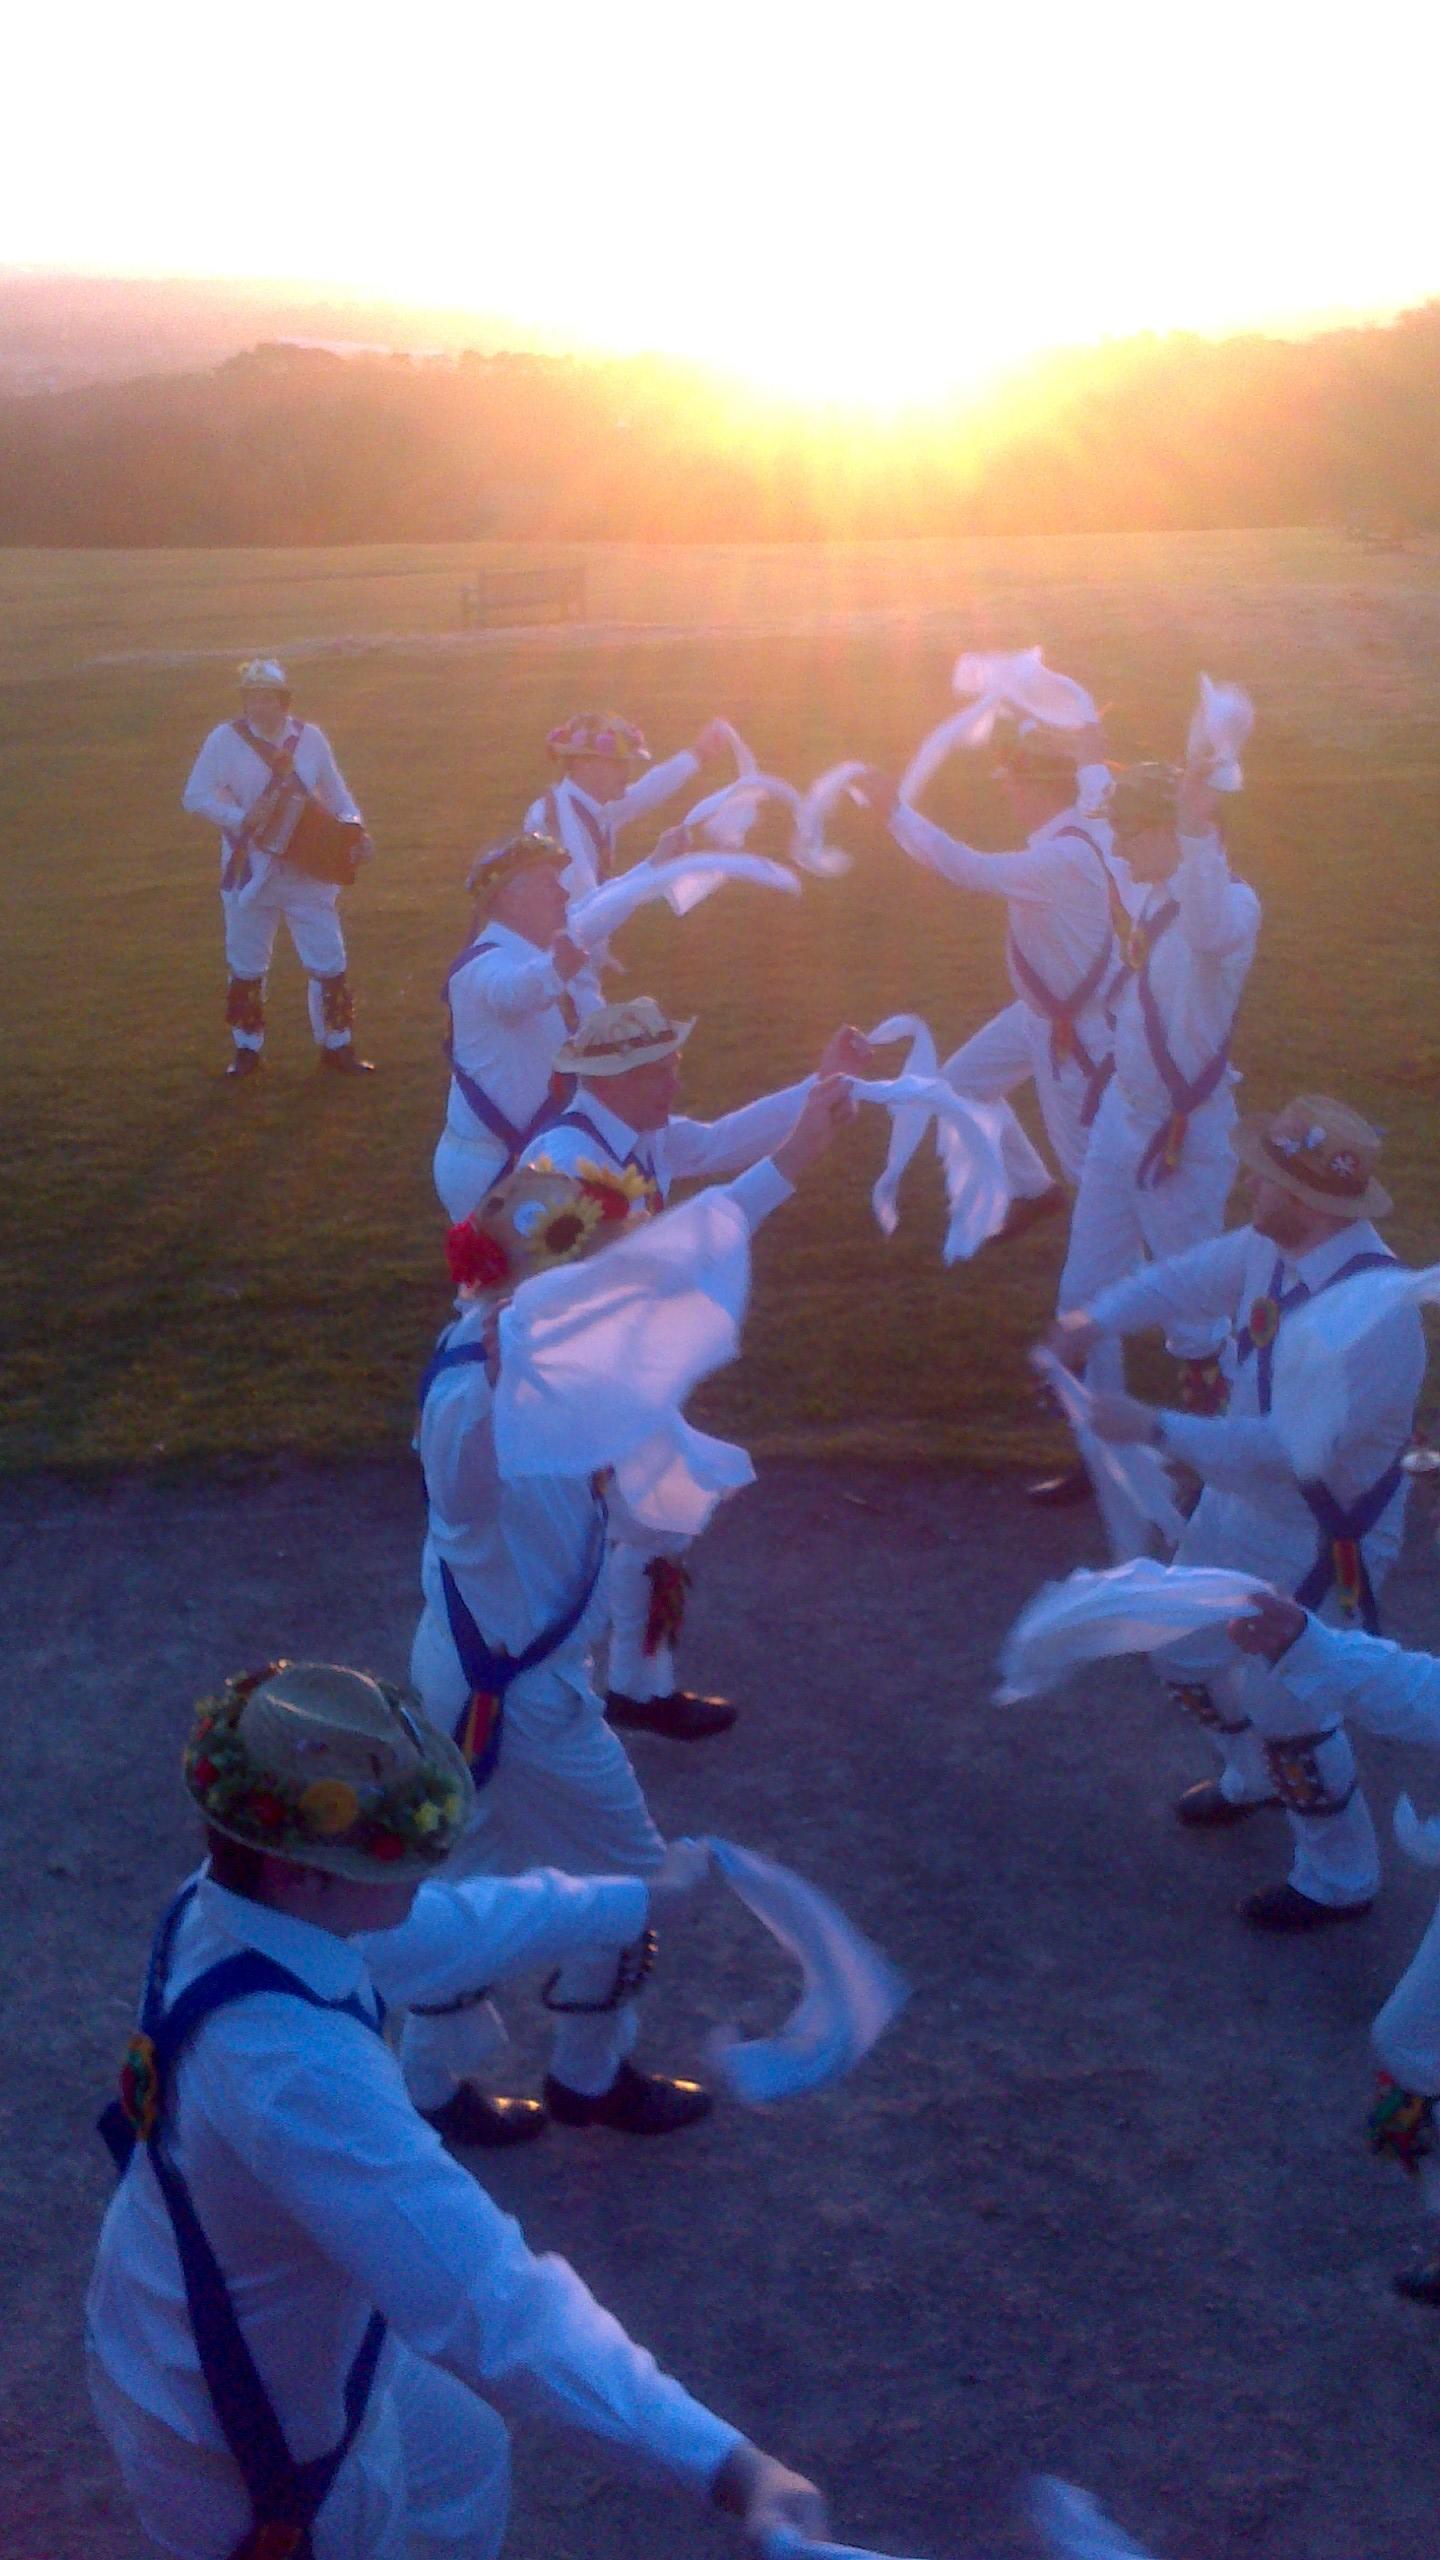 Jockey Dancing on The Lickey Hills - Sunrise on May 1st 2013